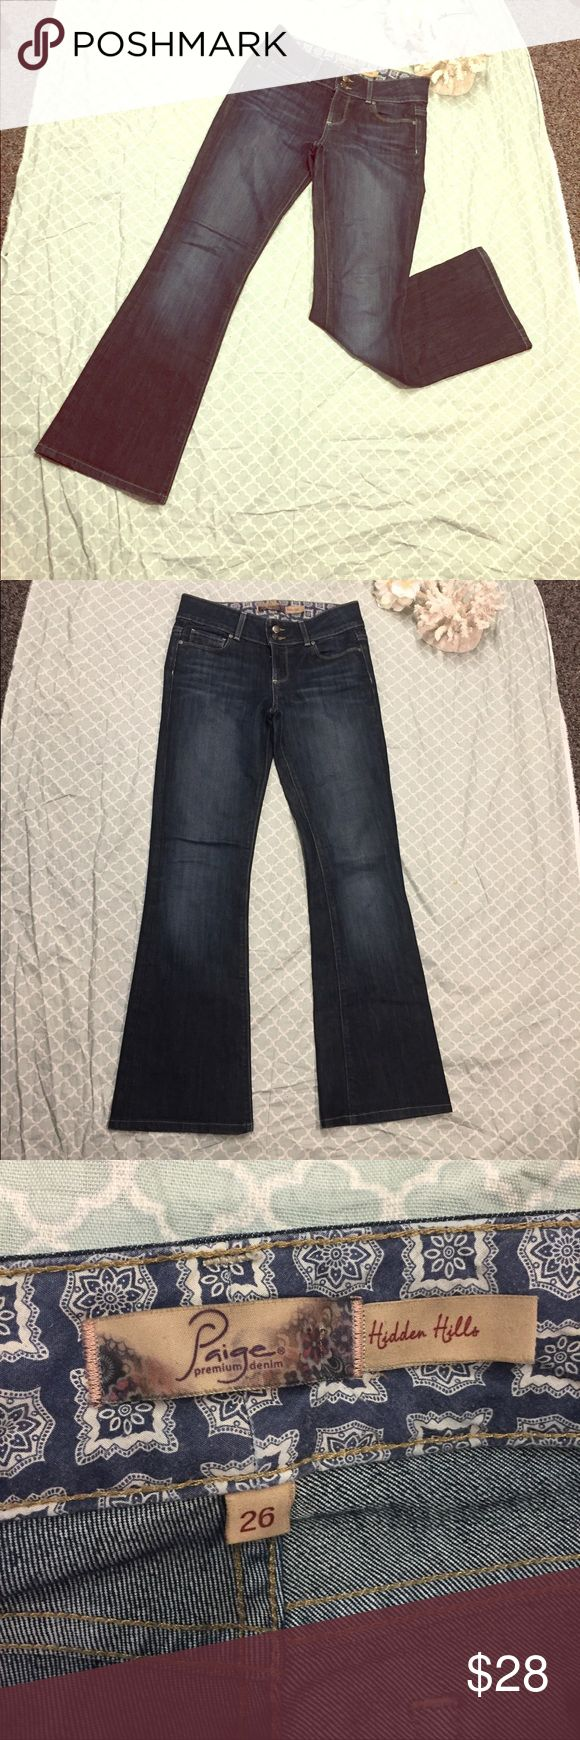 "Paige Premium Denim Dark Wash Hidden Hills Jean 26 Paige Premium Denim Dark Wash Hidden Hills Jeans SZ 26 w/ 30""Inseam. EUC adorable designer jeans. Super flattering, nice and dark with the perfect stiffness. Paige Jeans Jeans Flare & Wide Leg"